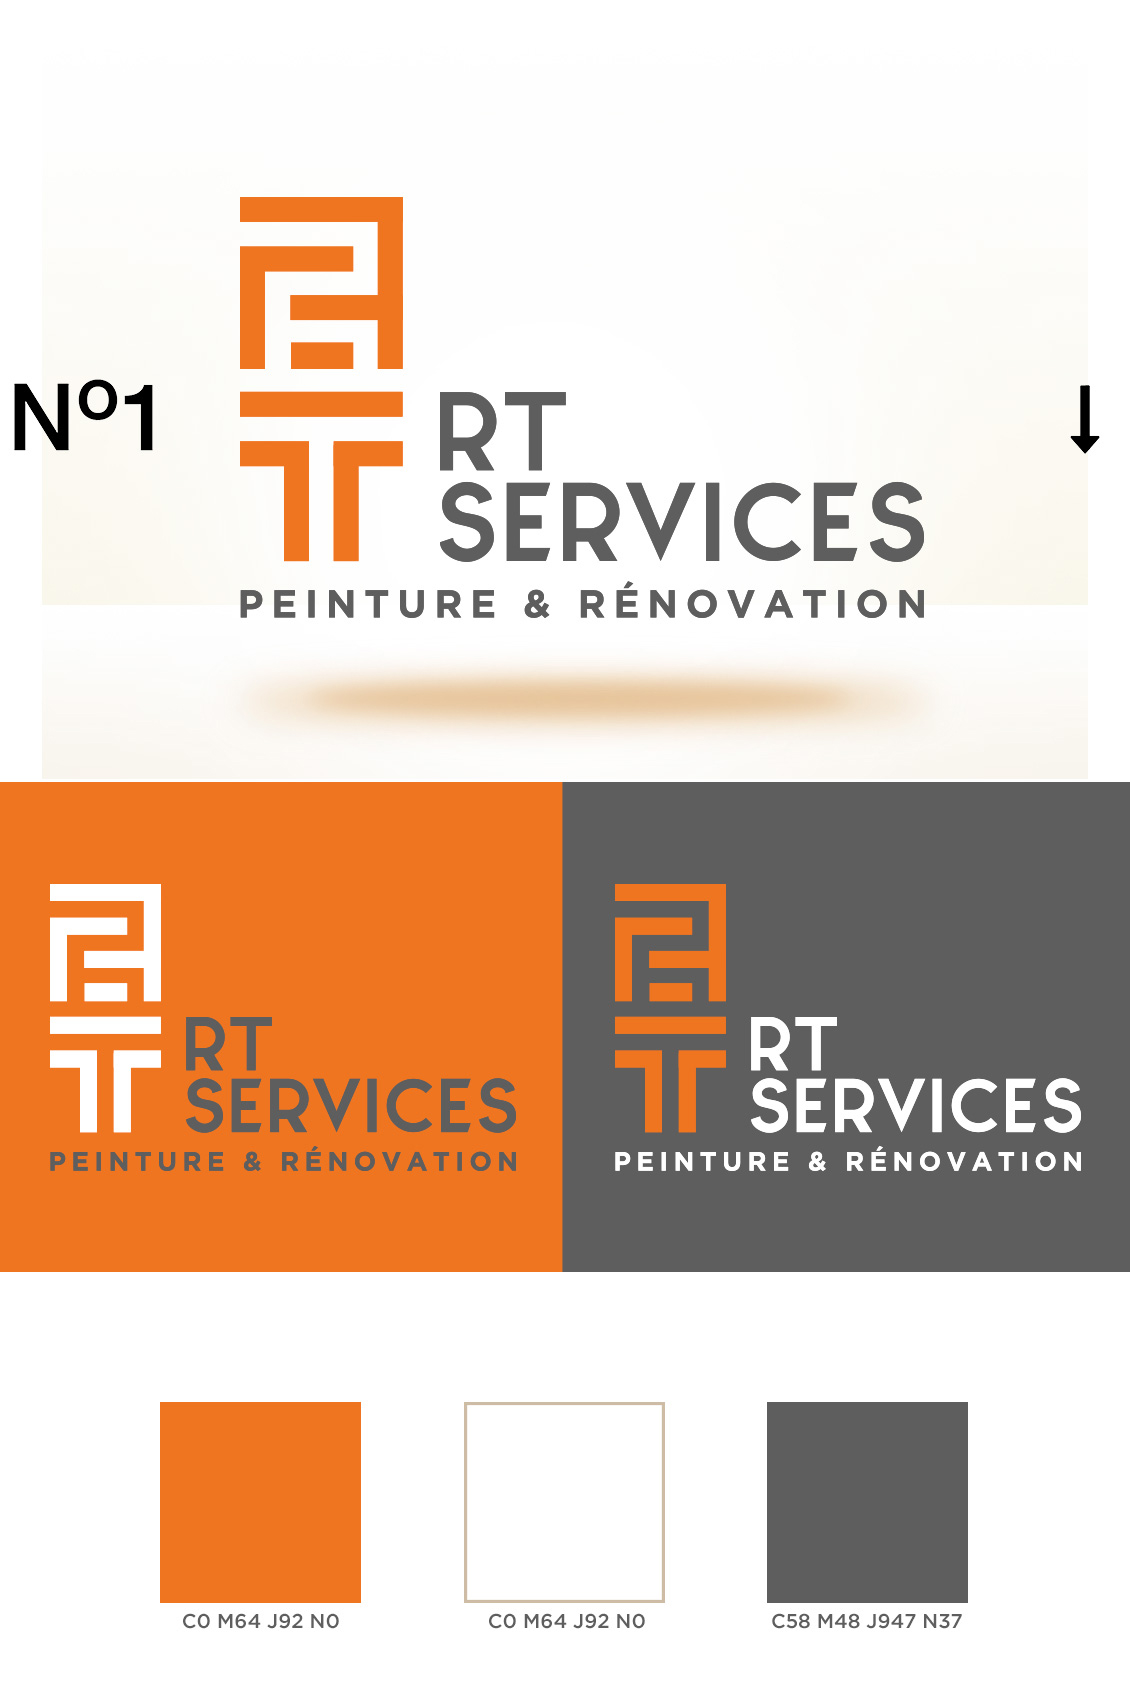 logo-rt-services-retenu-spikulu-1-sur-2